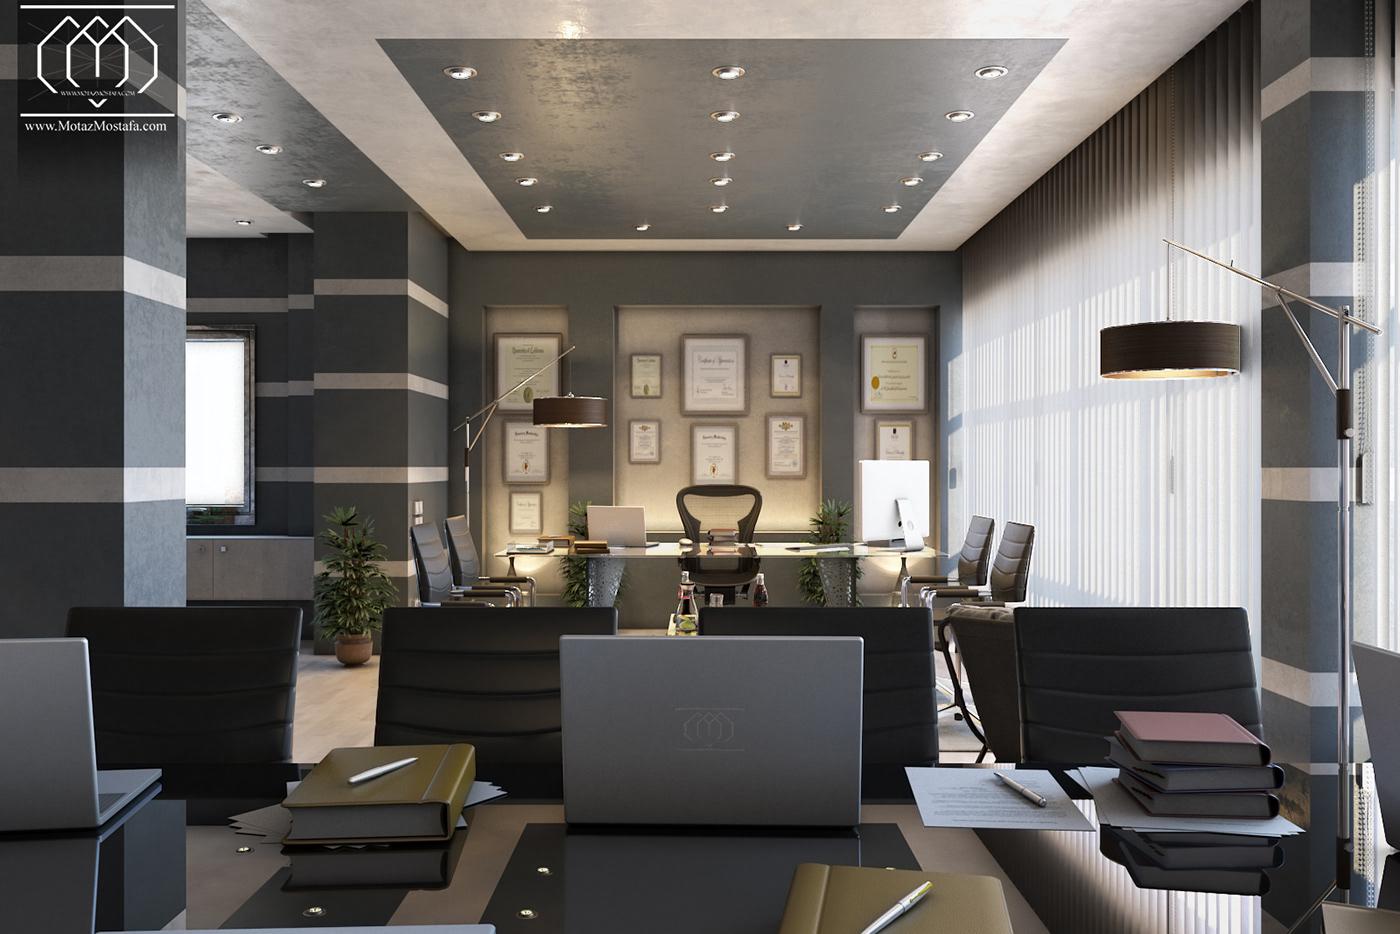 architecture interior design  design inteiror 3dsmax vray graphics visualization Motaz mostafa